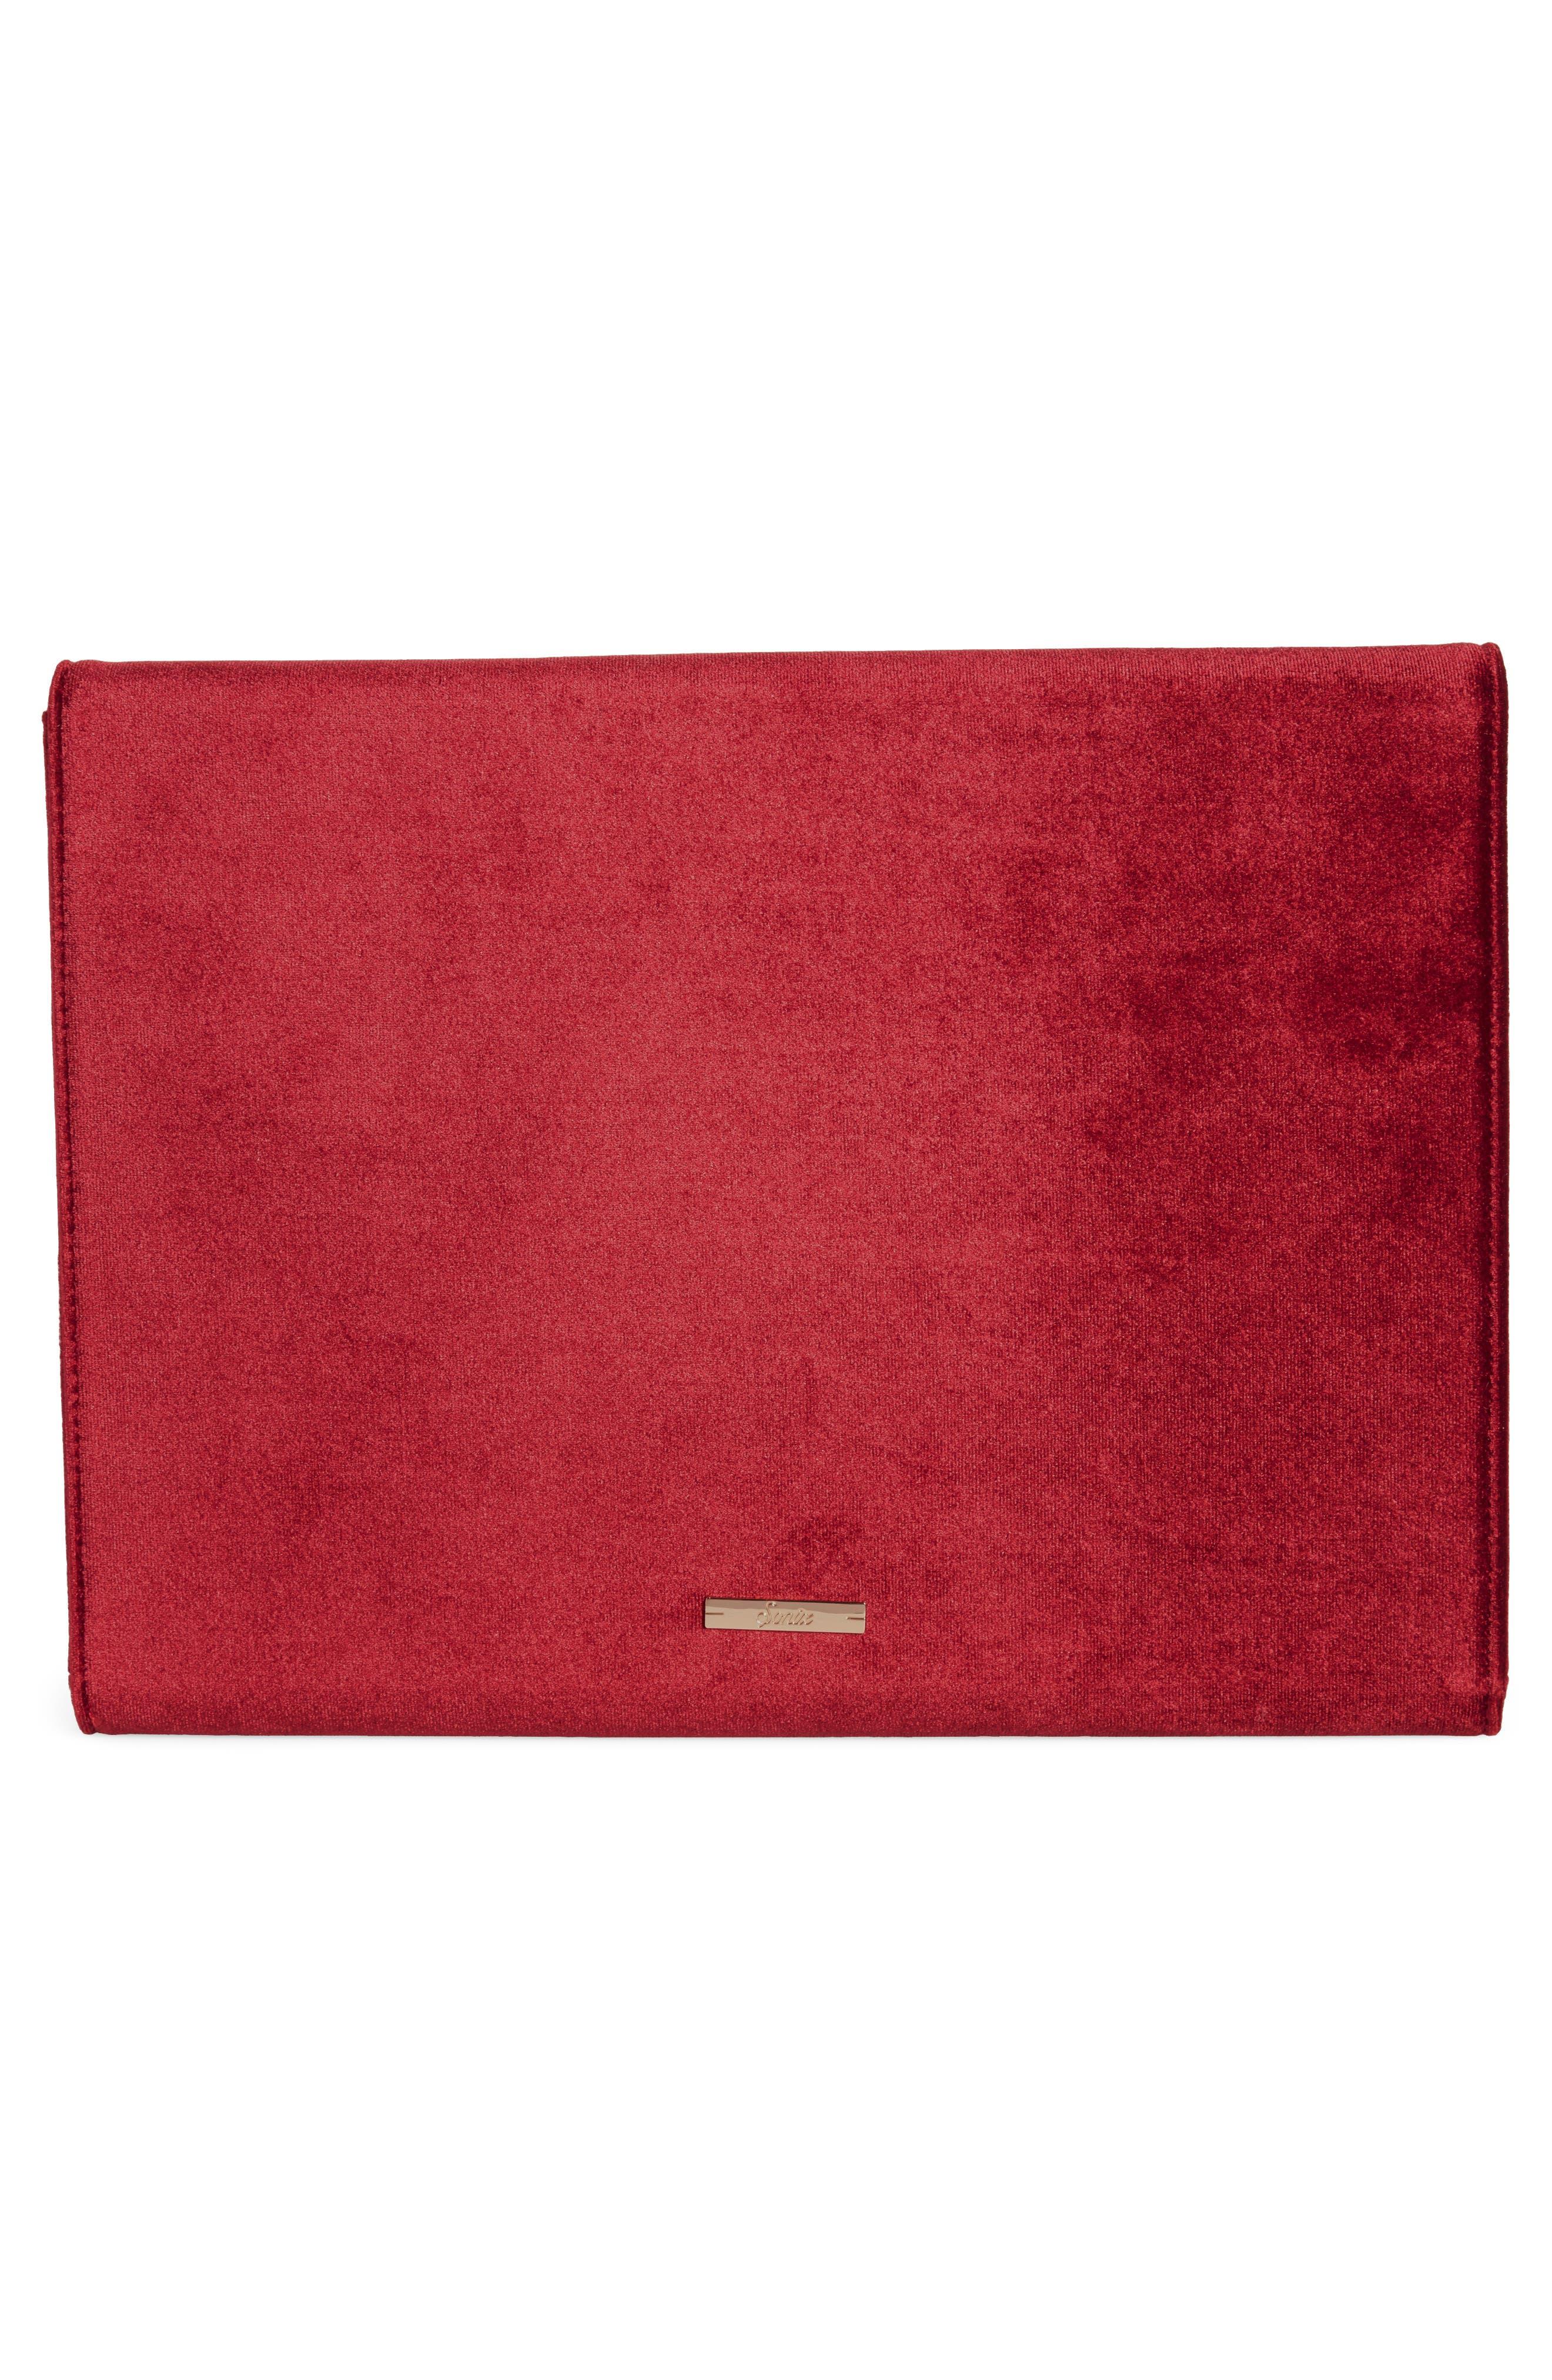 Alternate Image 2  - Sonix Red Velvet Laptop Clutch